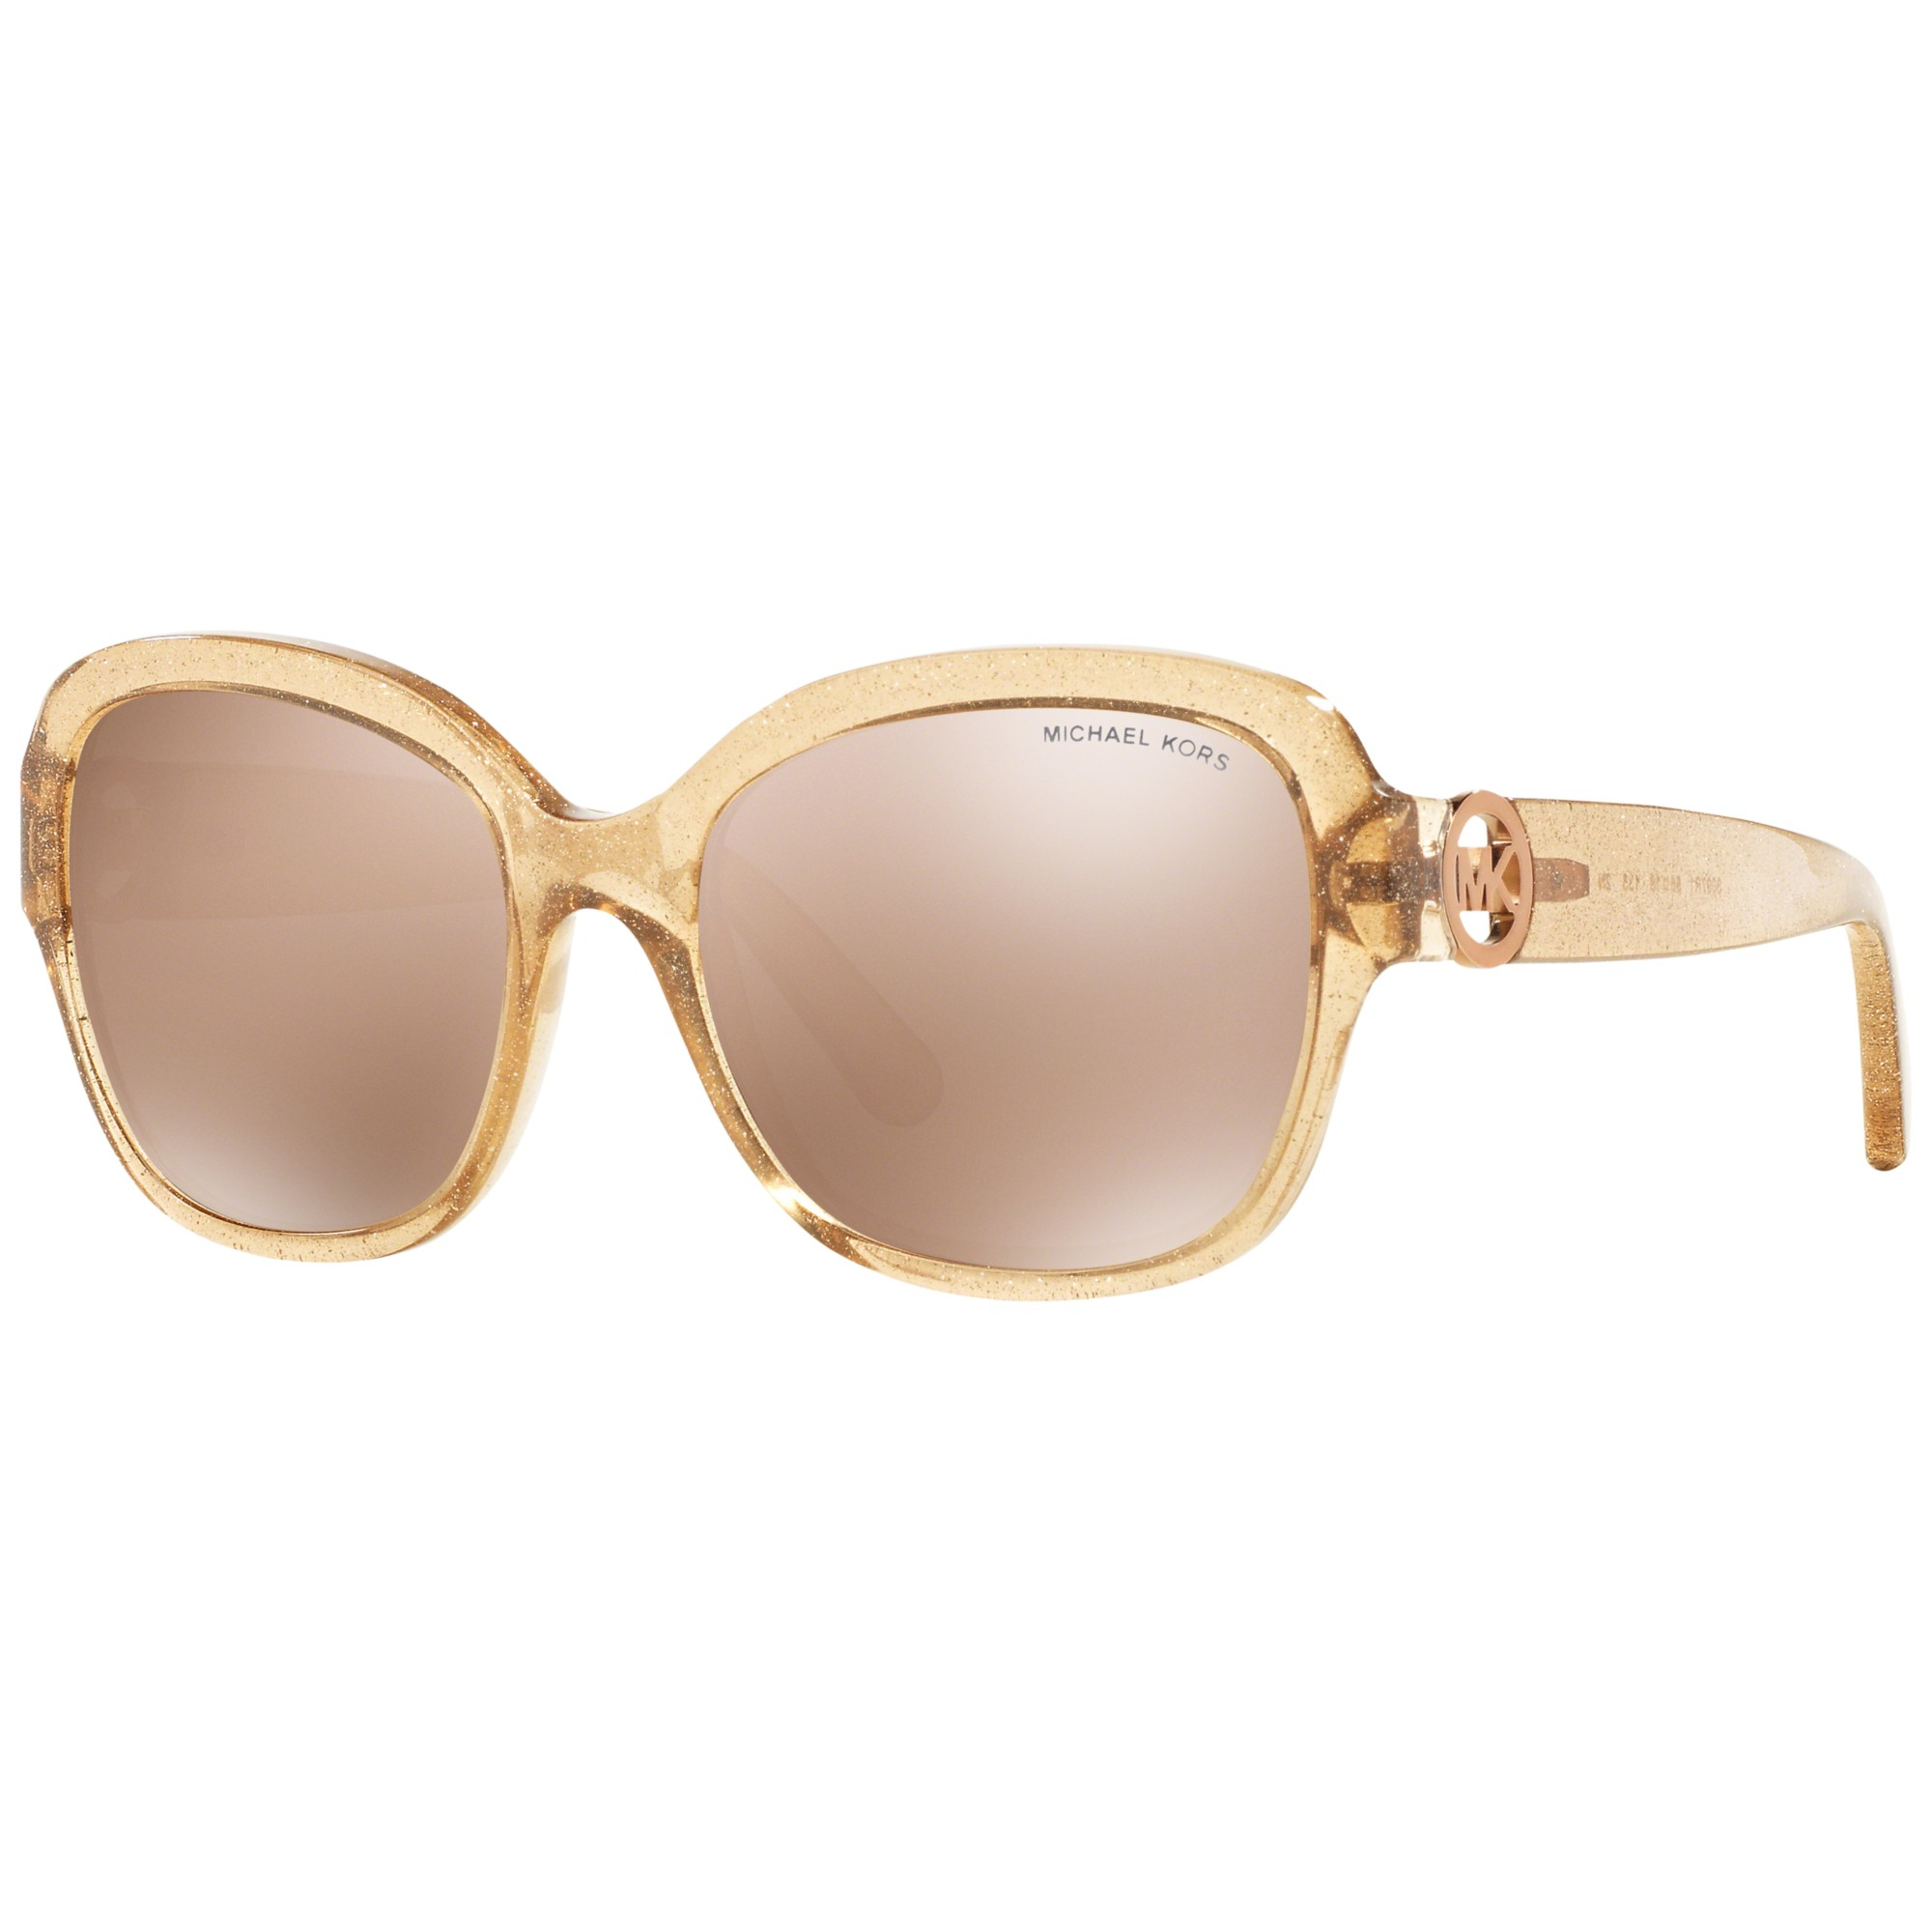 73428bba05 Michael Kors Mk6027 Tabitha Iii Polarised Square Sunglasses in ...